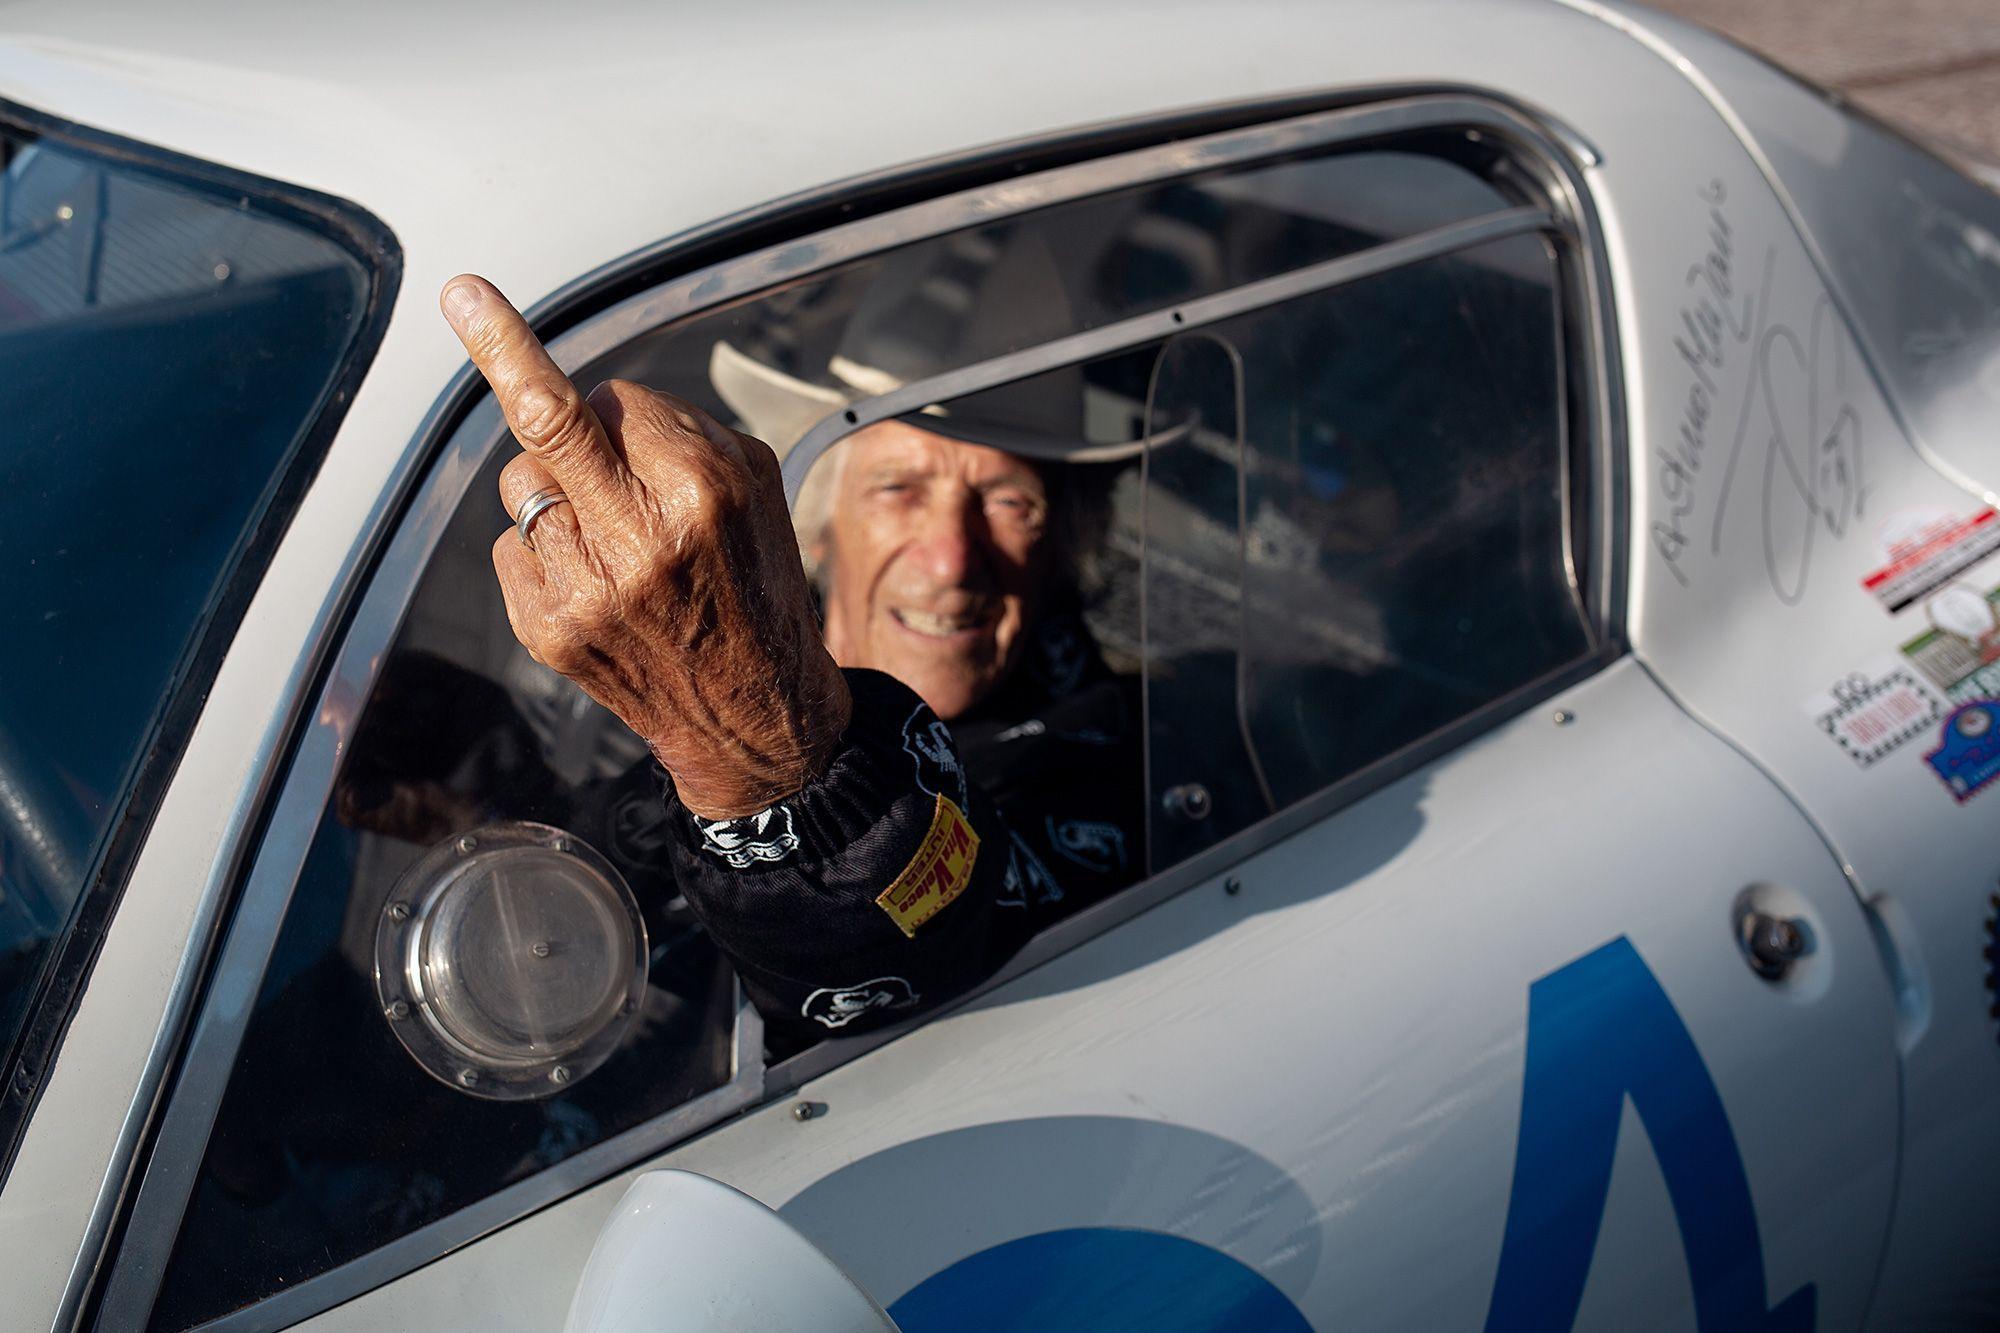 Arturo Merzario for IUTER x Abarth Capsule collection F1 Legend Arturo shot by Royale77